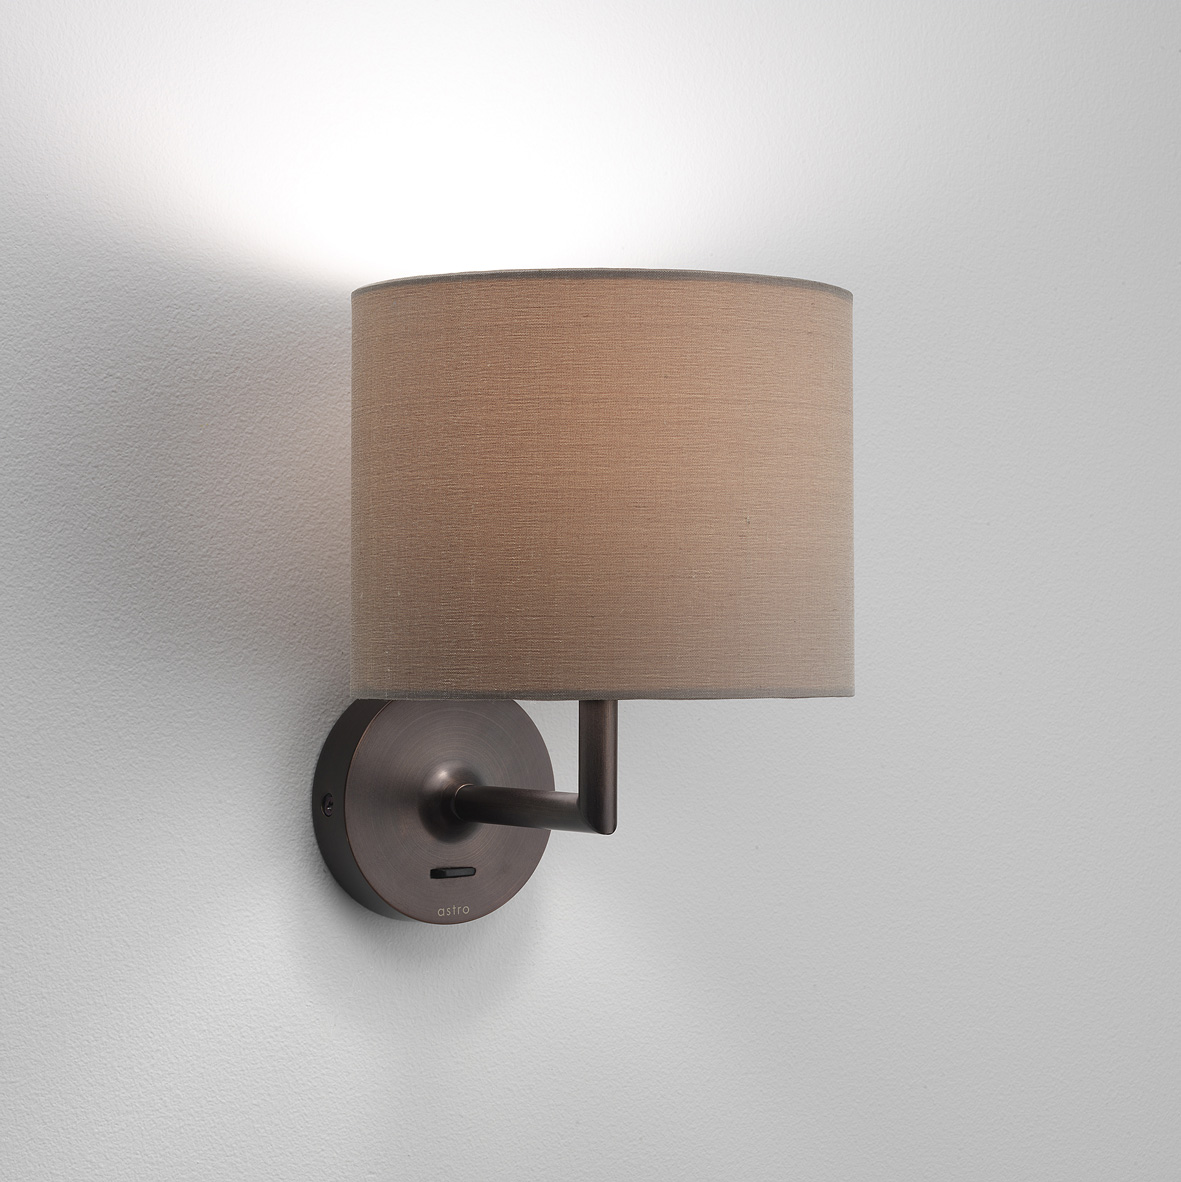 Astro appa interior wall light 60w e14 lamp switched chrome matt sentinel astro appa interior wall light 60w e14 lamp switched chrome matt nickel bronze aloadofball Image collections